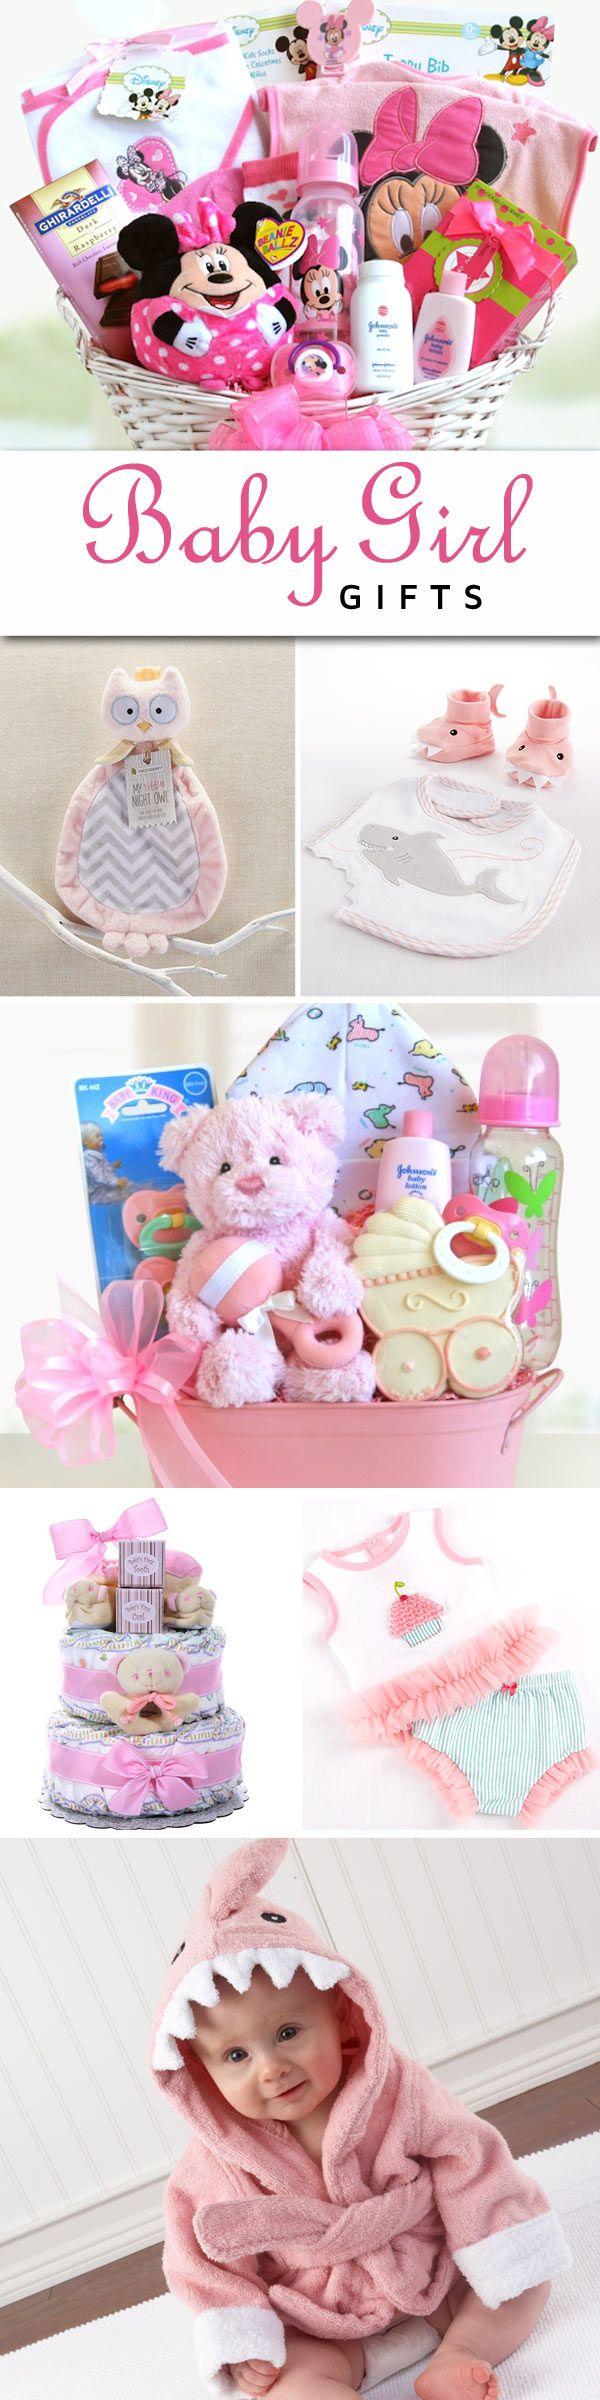 Baby Girl Gift items.